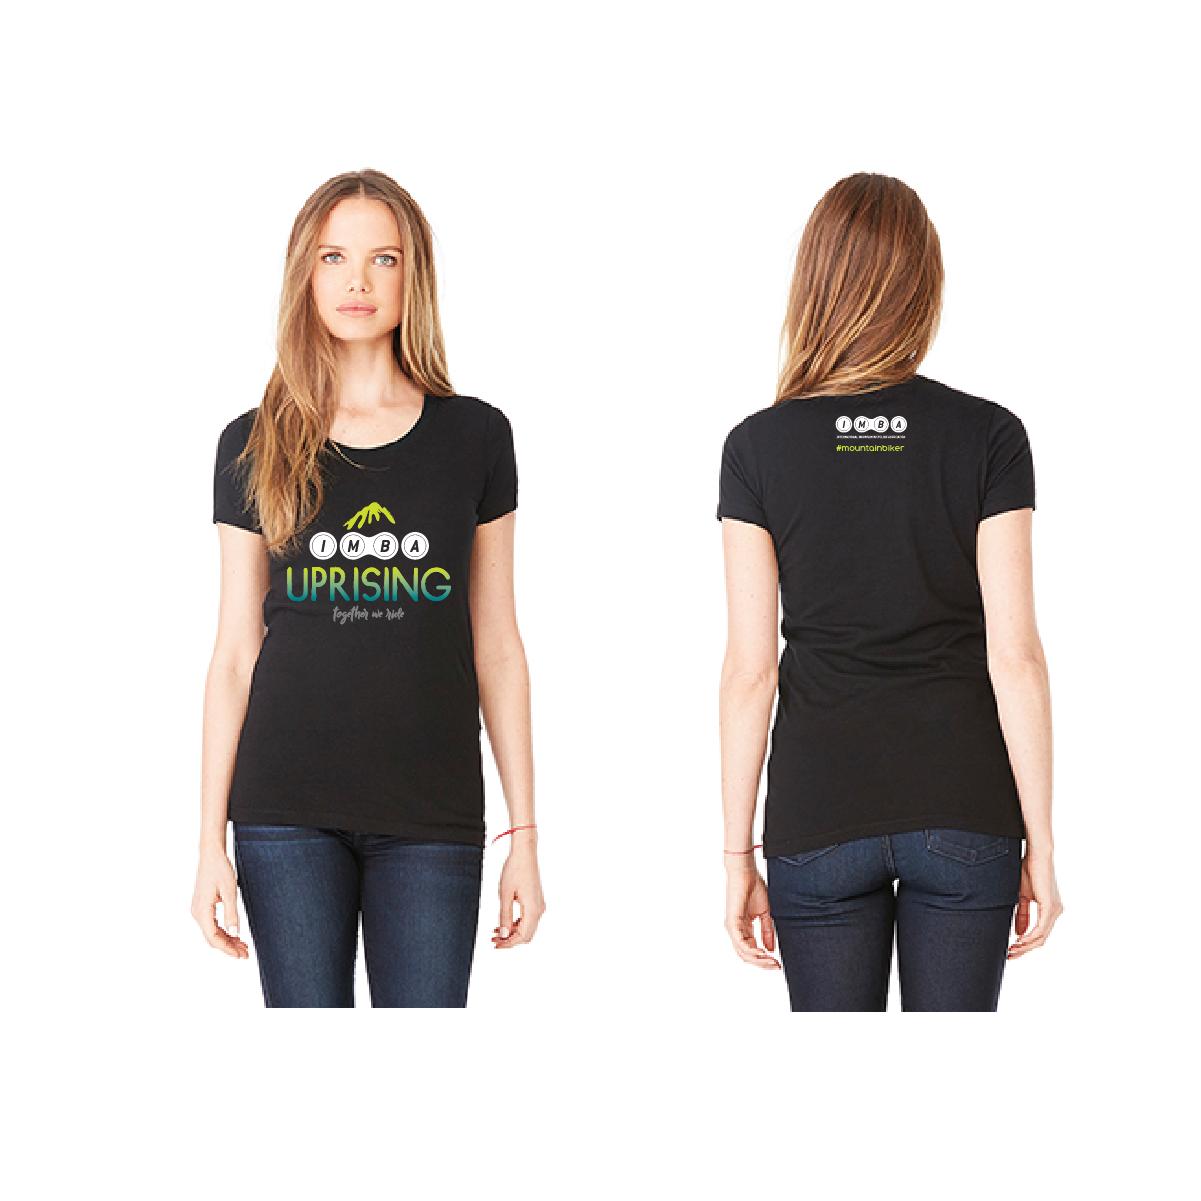 UPRISING-Team-Shirts_Blk-Shortsleeve-02.png